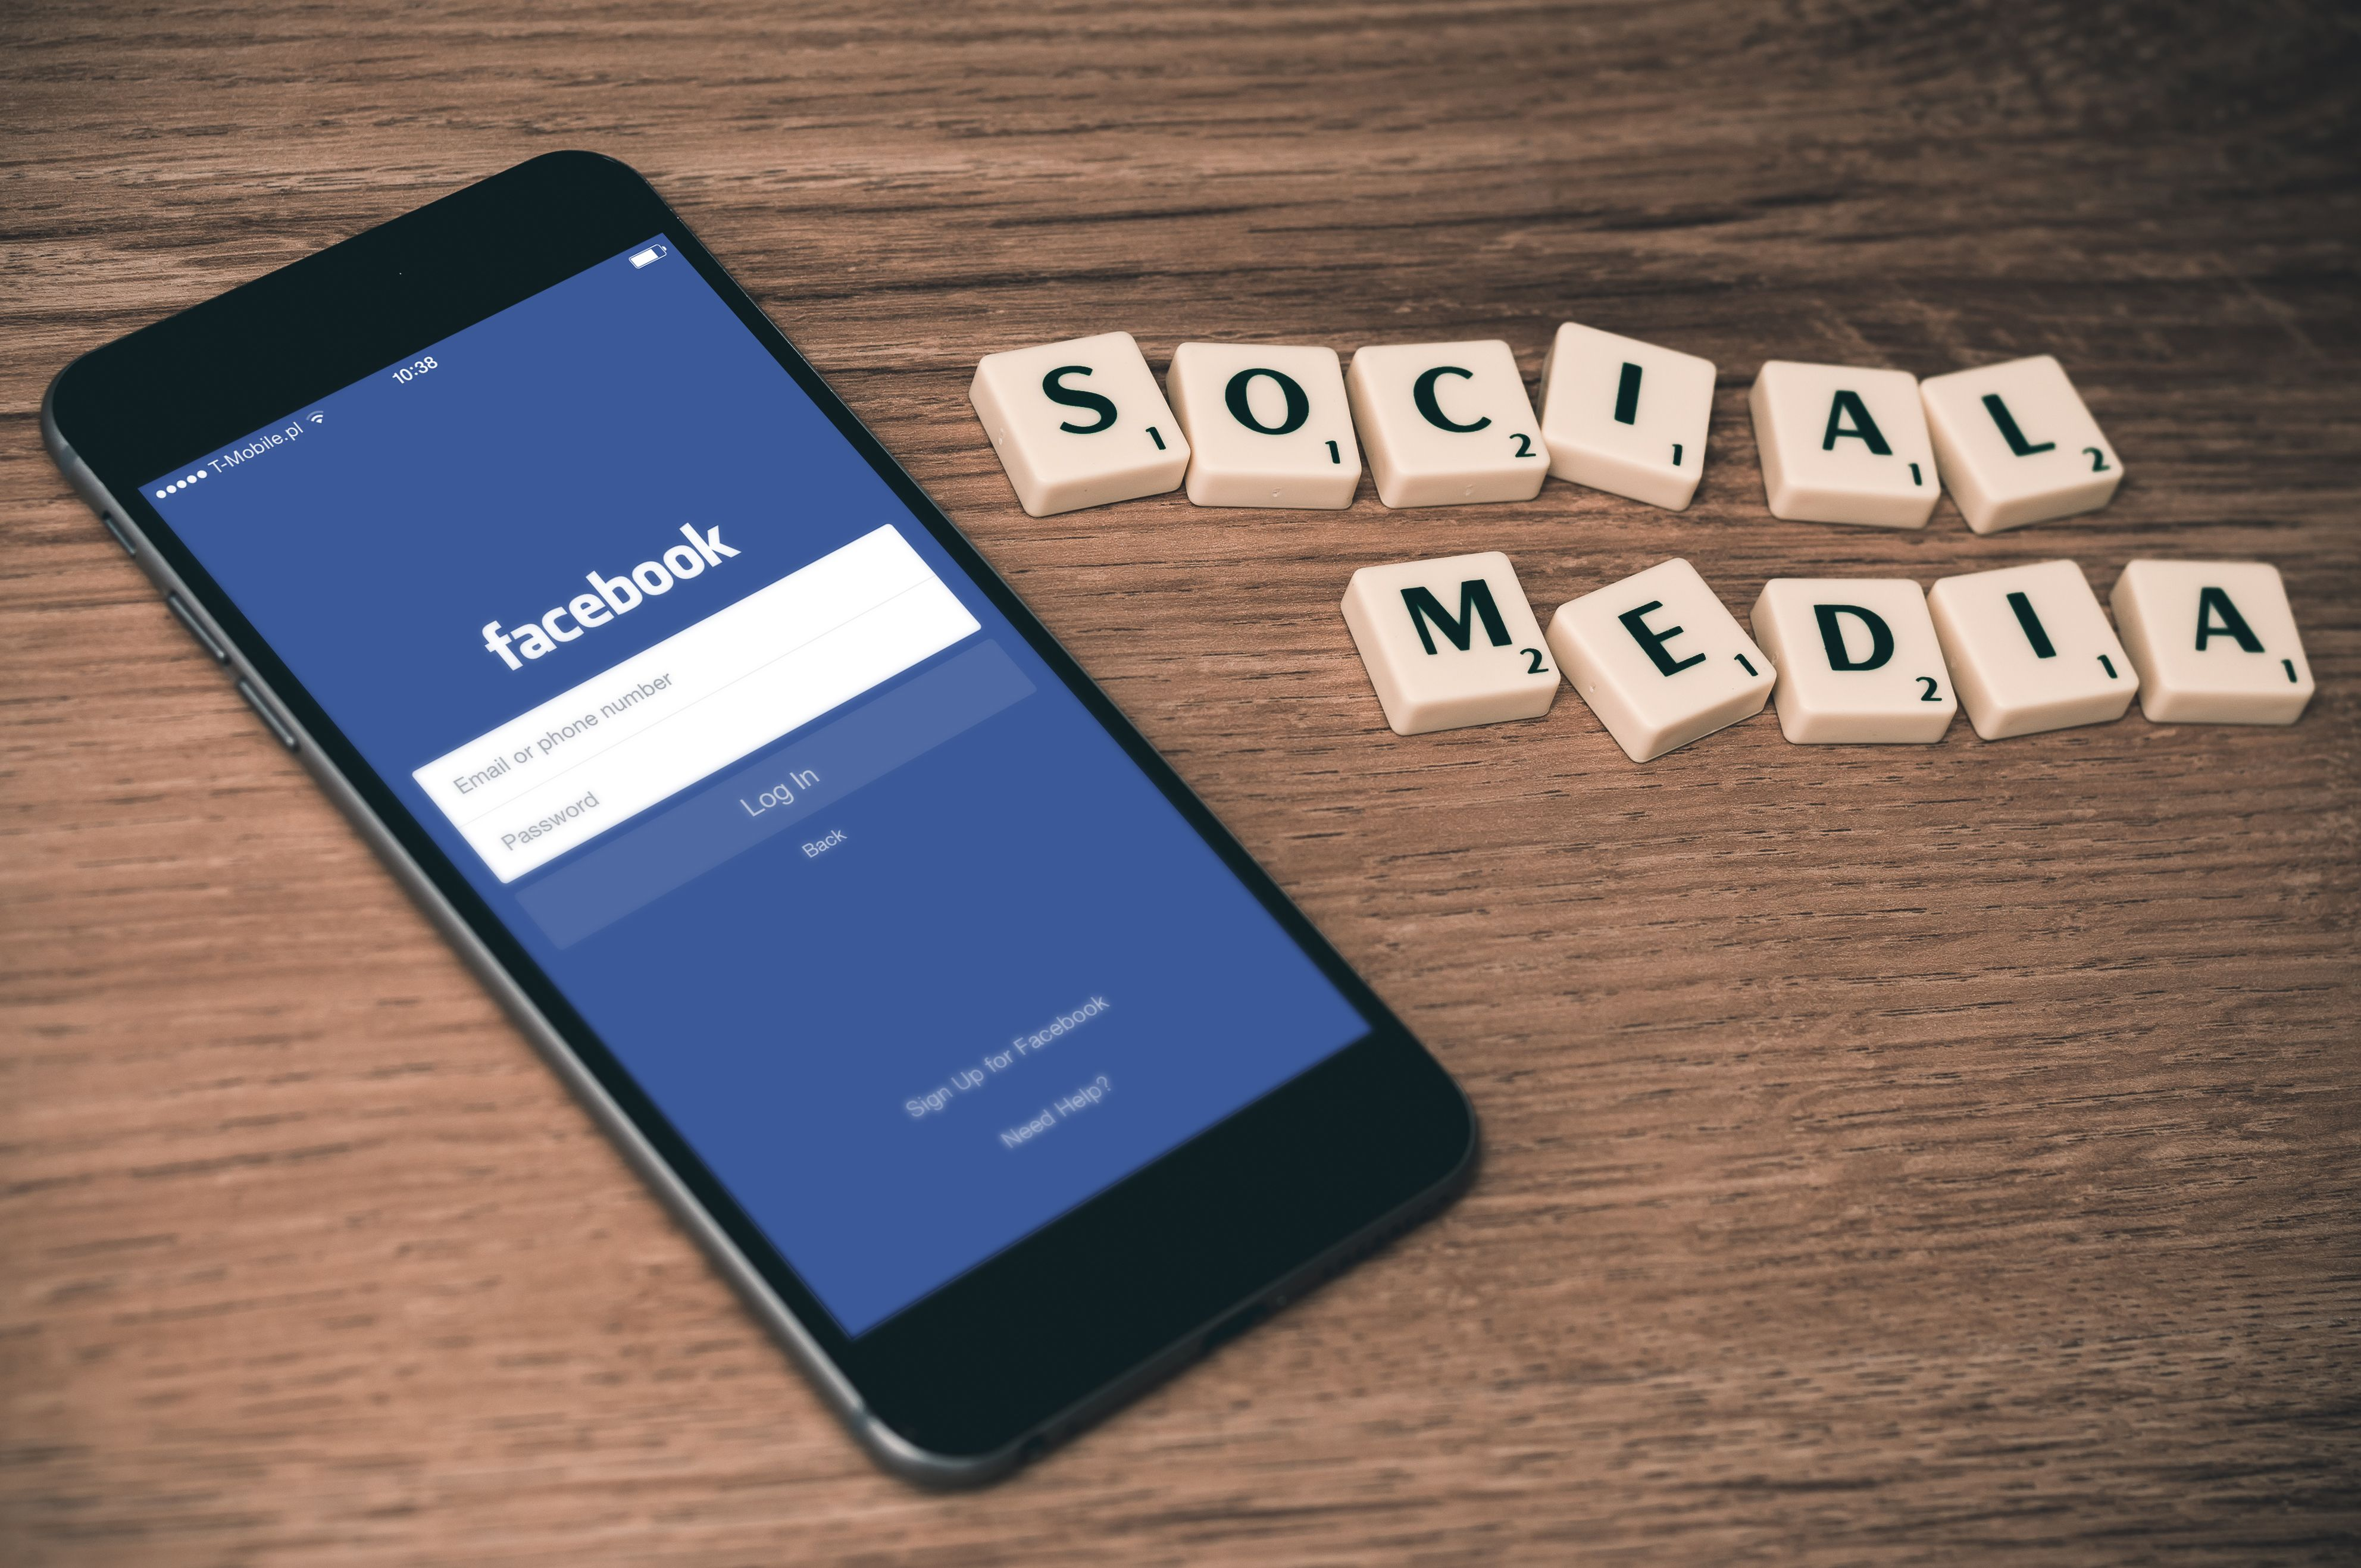 Facebook lança nova ferramenta para prevenir suicídios